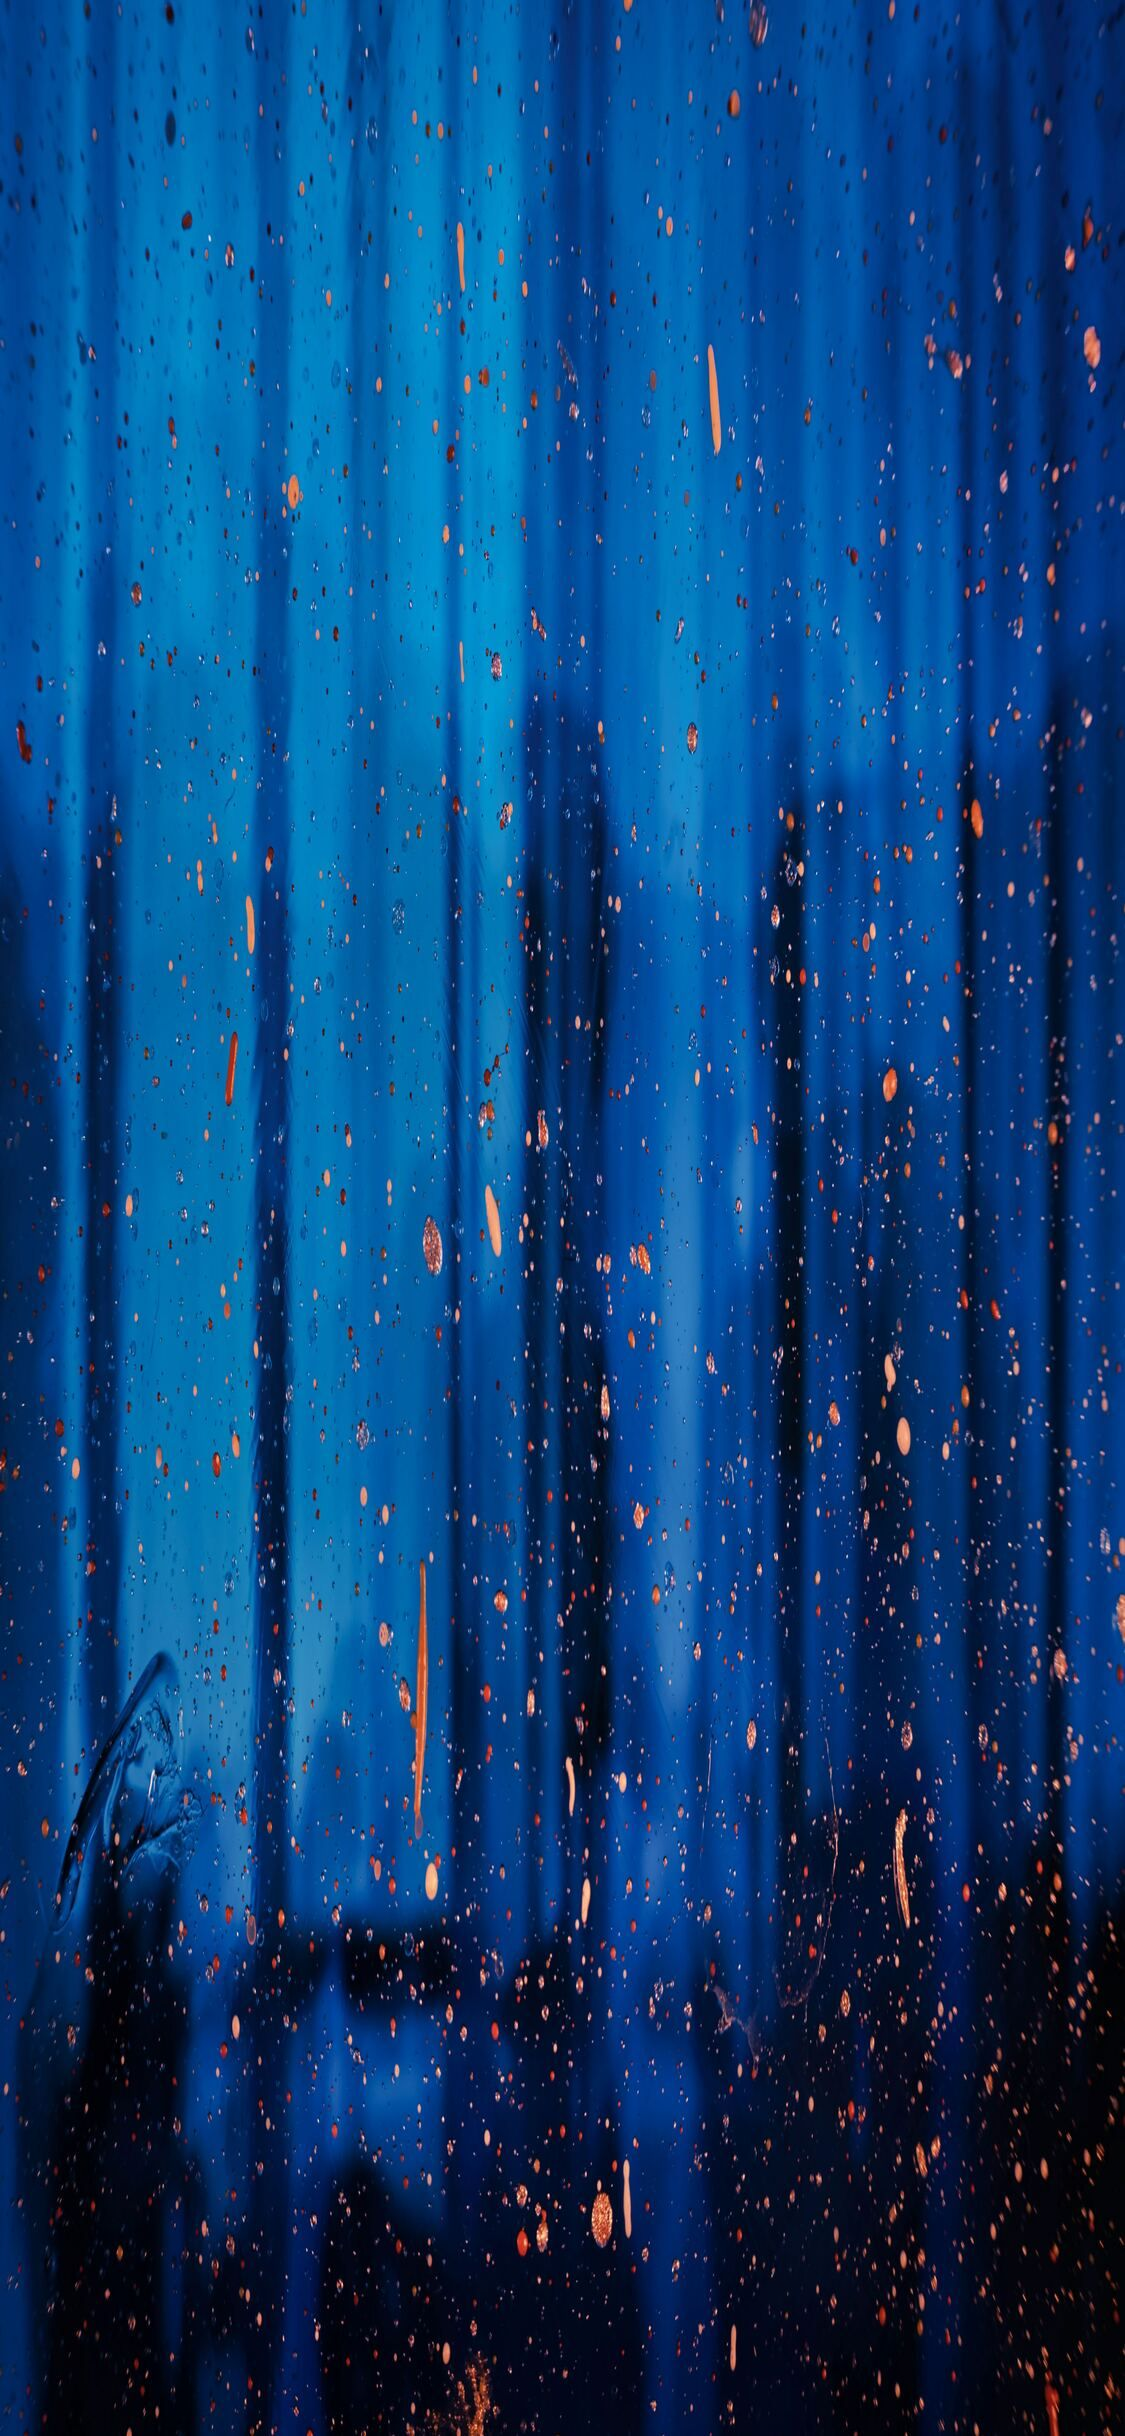 Aesthetic Wallpaper Hd Aesthetic Wallpapers Blue Background Wallpapers Black Aesthetic Wallpaper